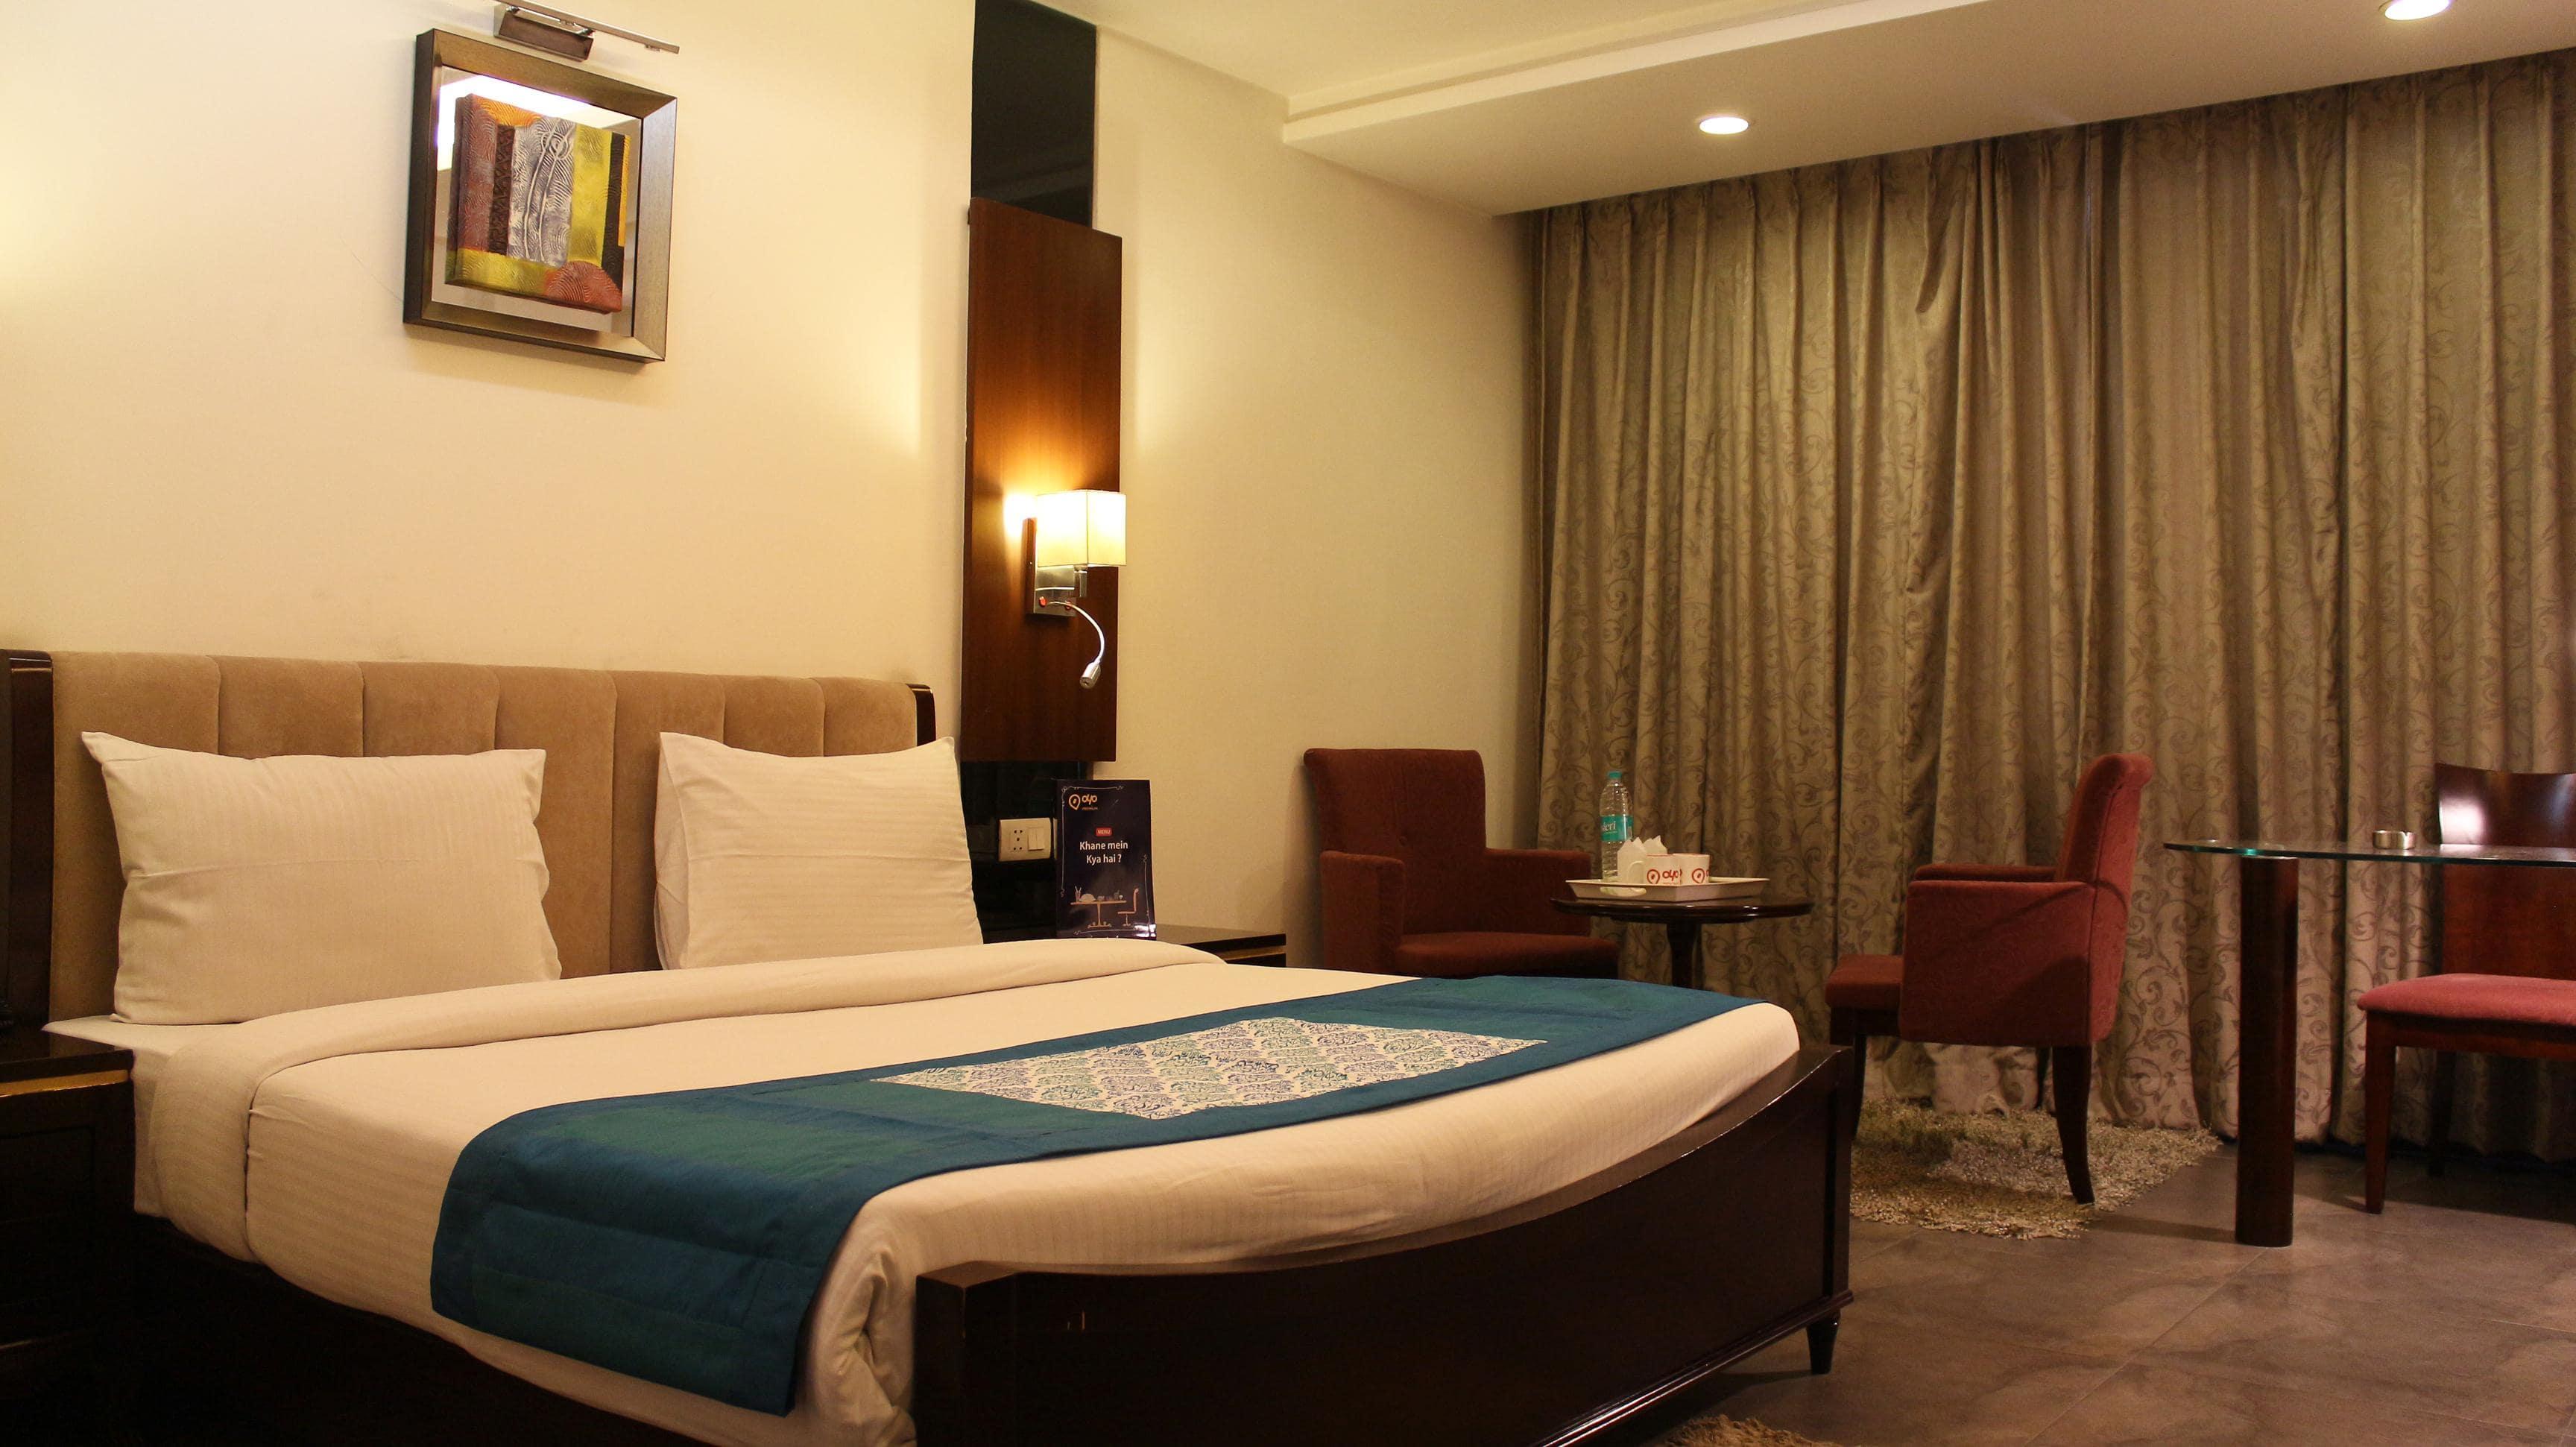 Oyo 1707 Hotel Habitare Continental in Gurugram